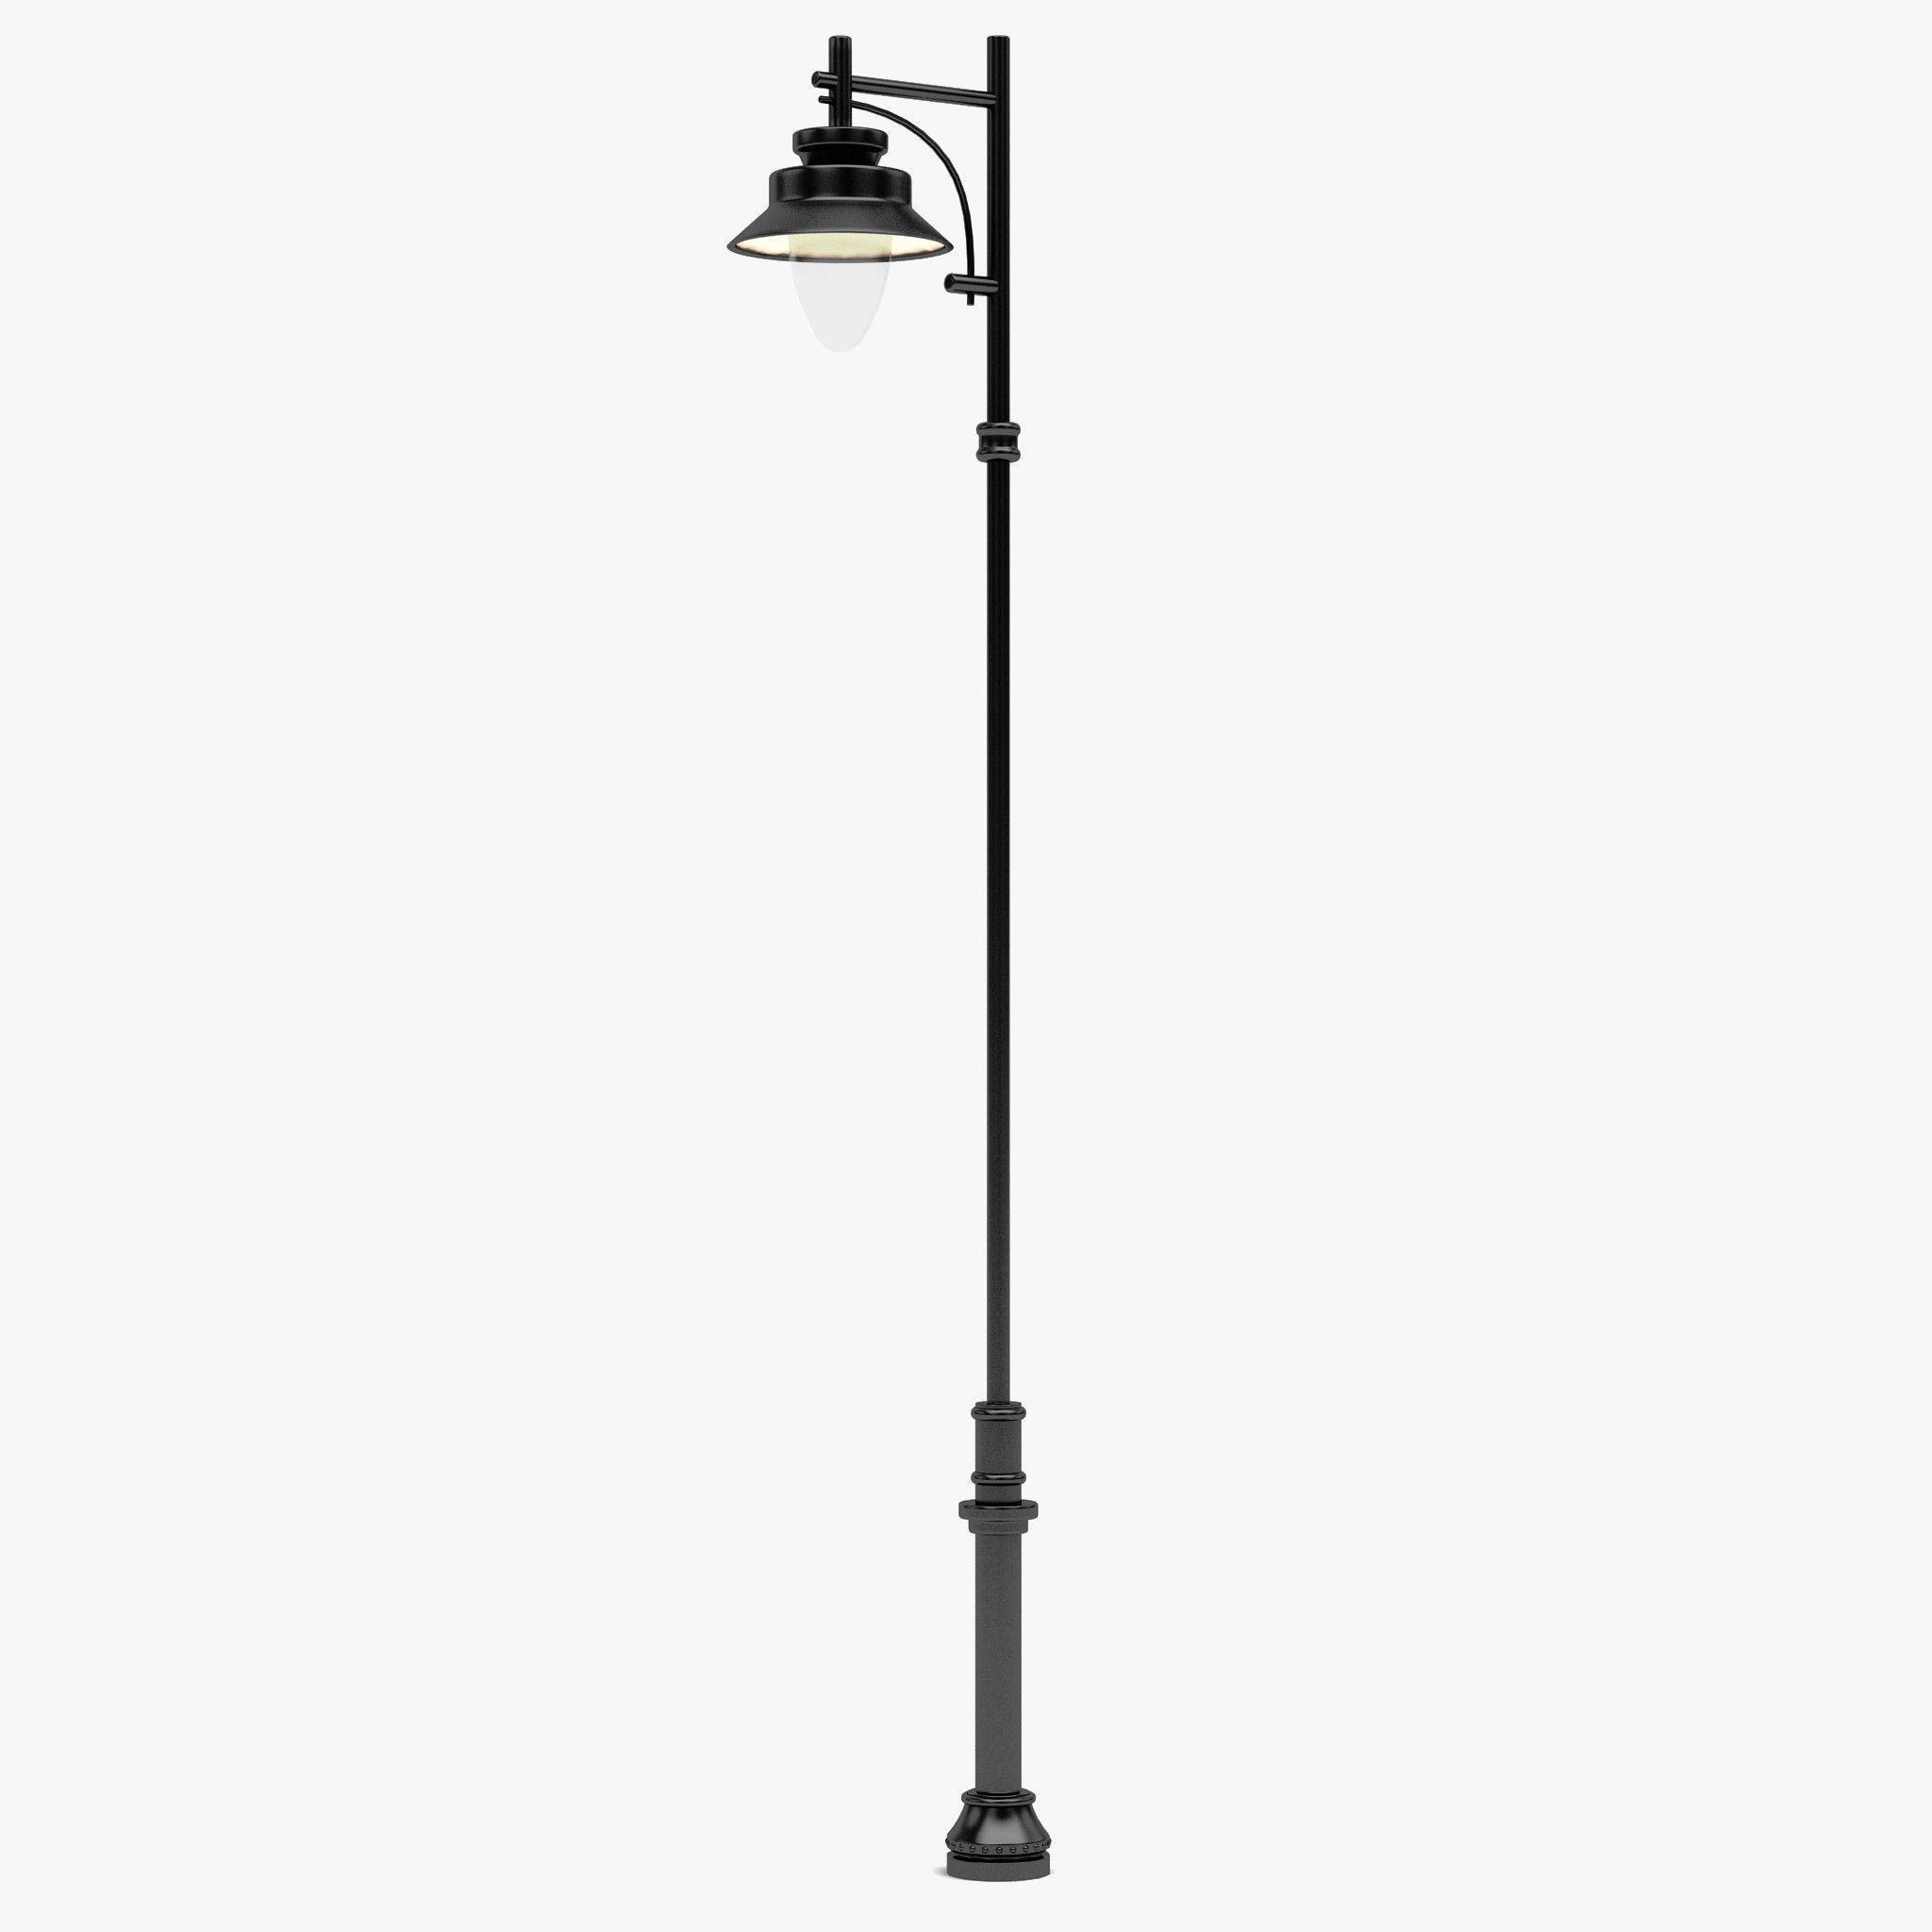 Victorian street lamp - Google 検索 | Pendants | Pinterest ... for Modern Street Lamps  183qdu